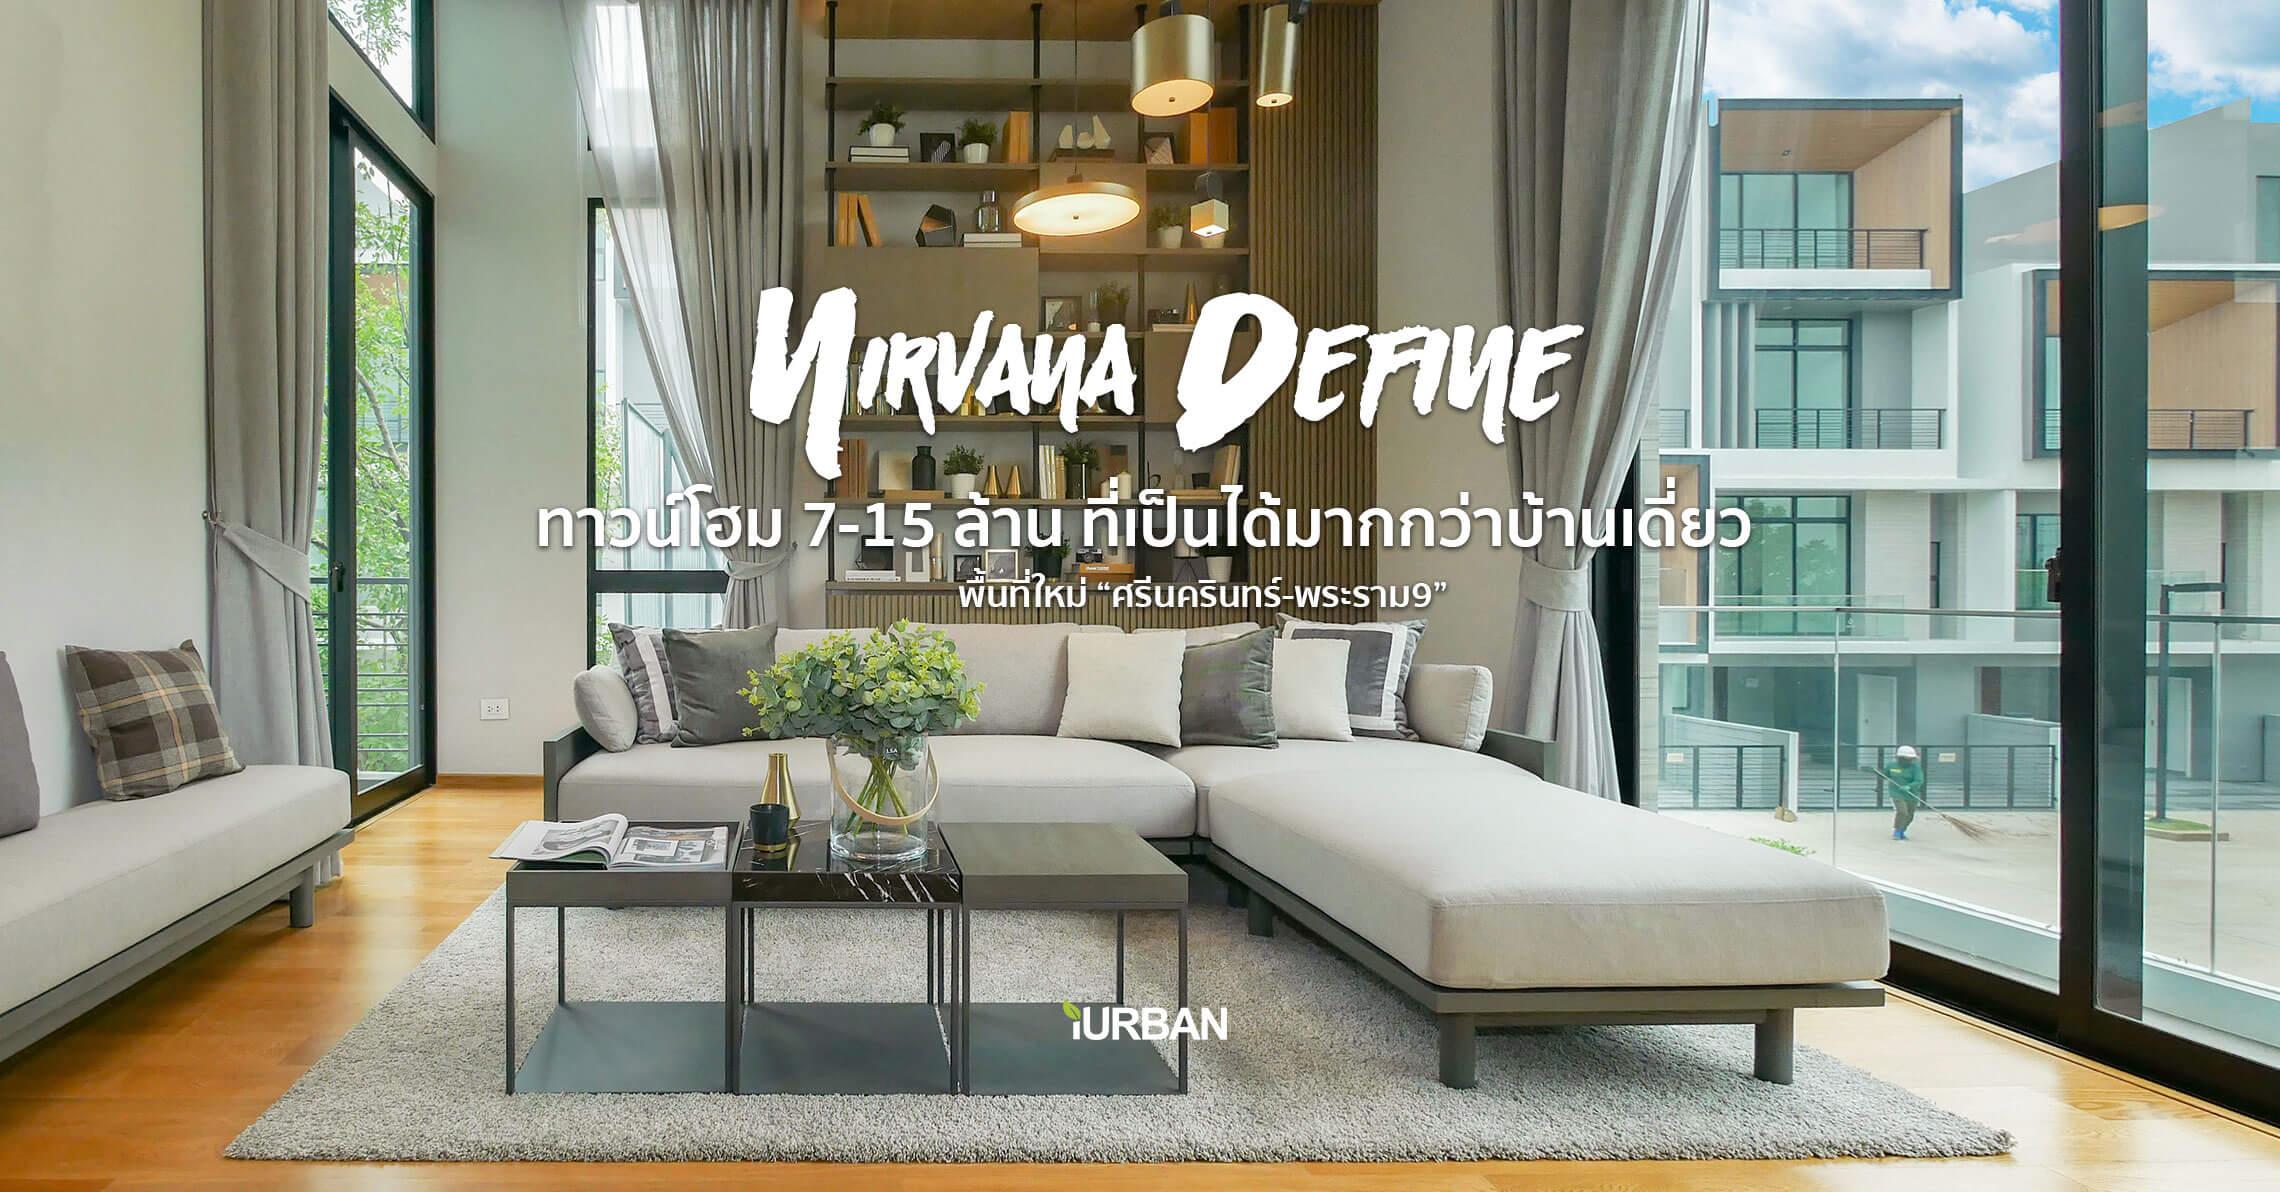 Nirvana DEFINE ศรีนครินทร์ - พระราม9 ทาวน์โฮมที่เป็นได้มากกว่าบ้านเดี่ยว 13 - Nirvana